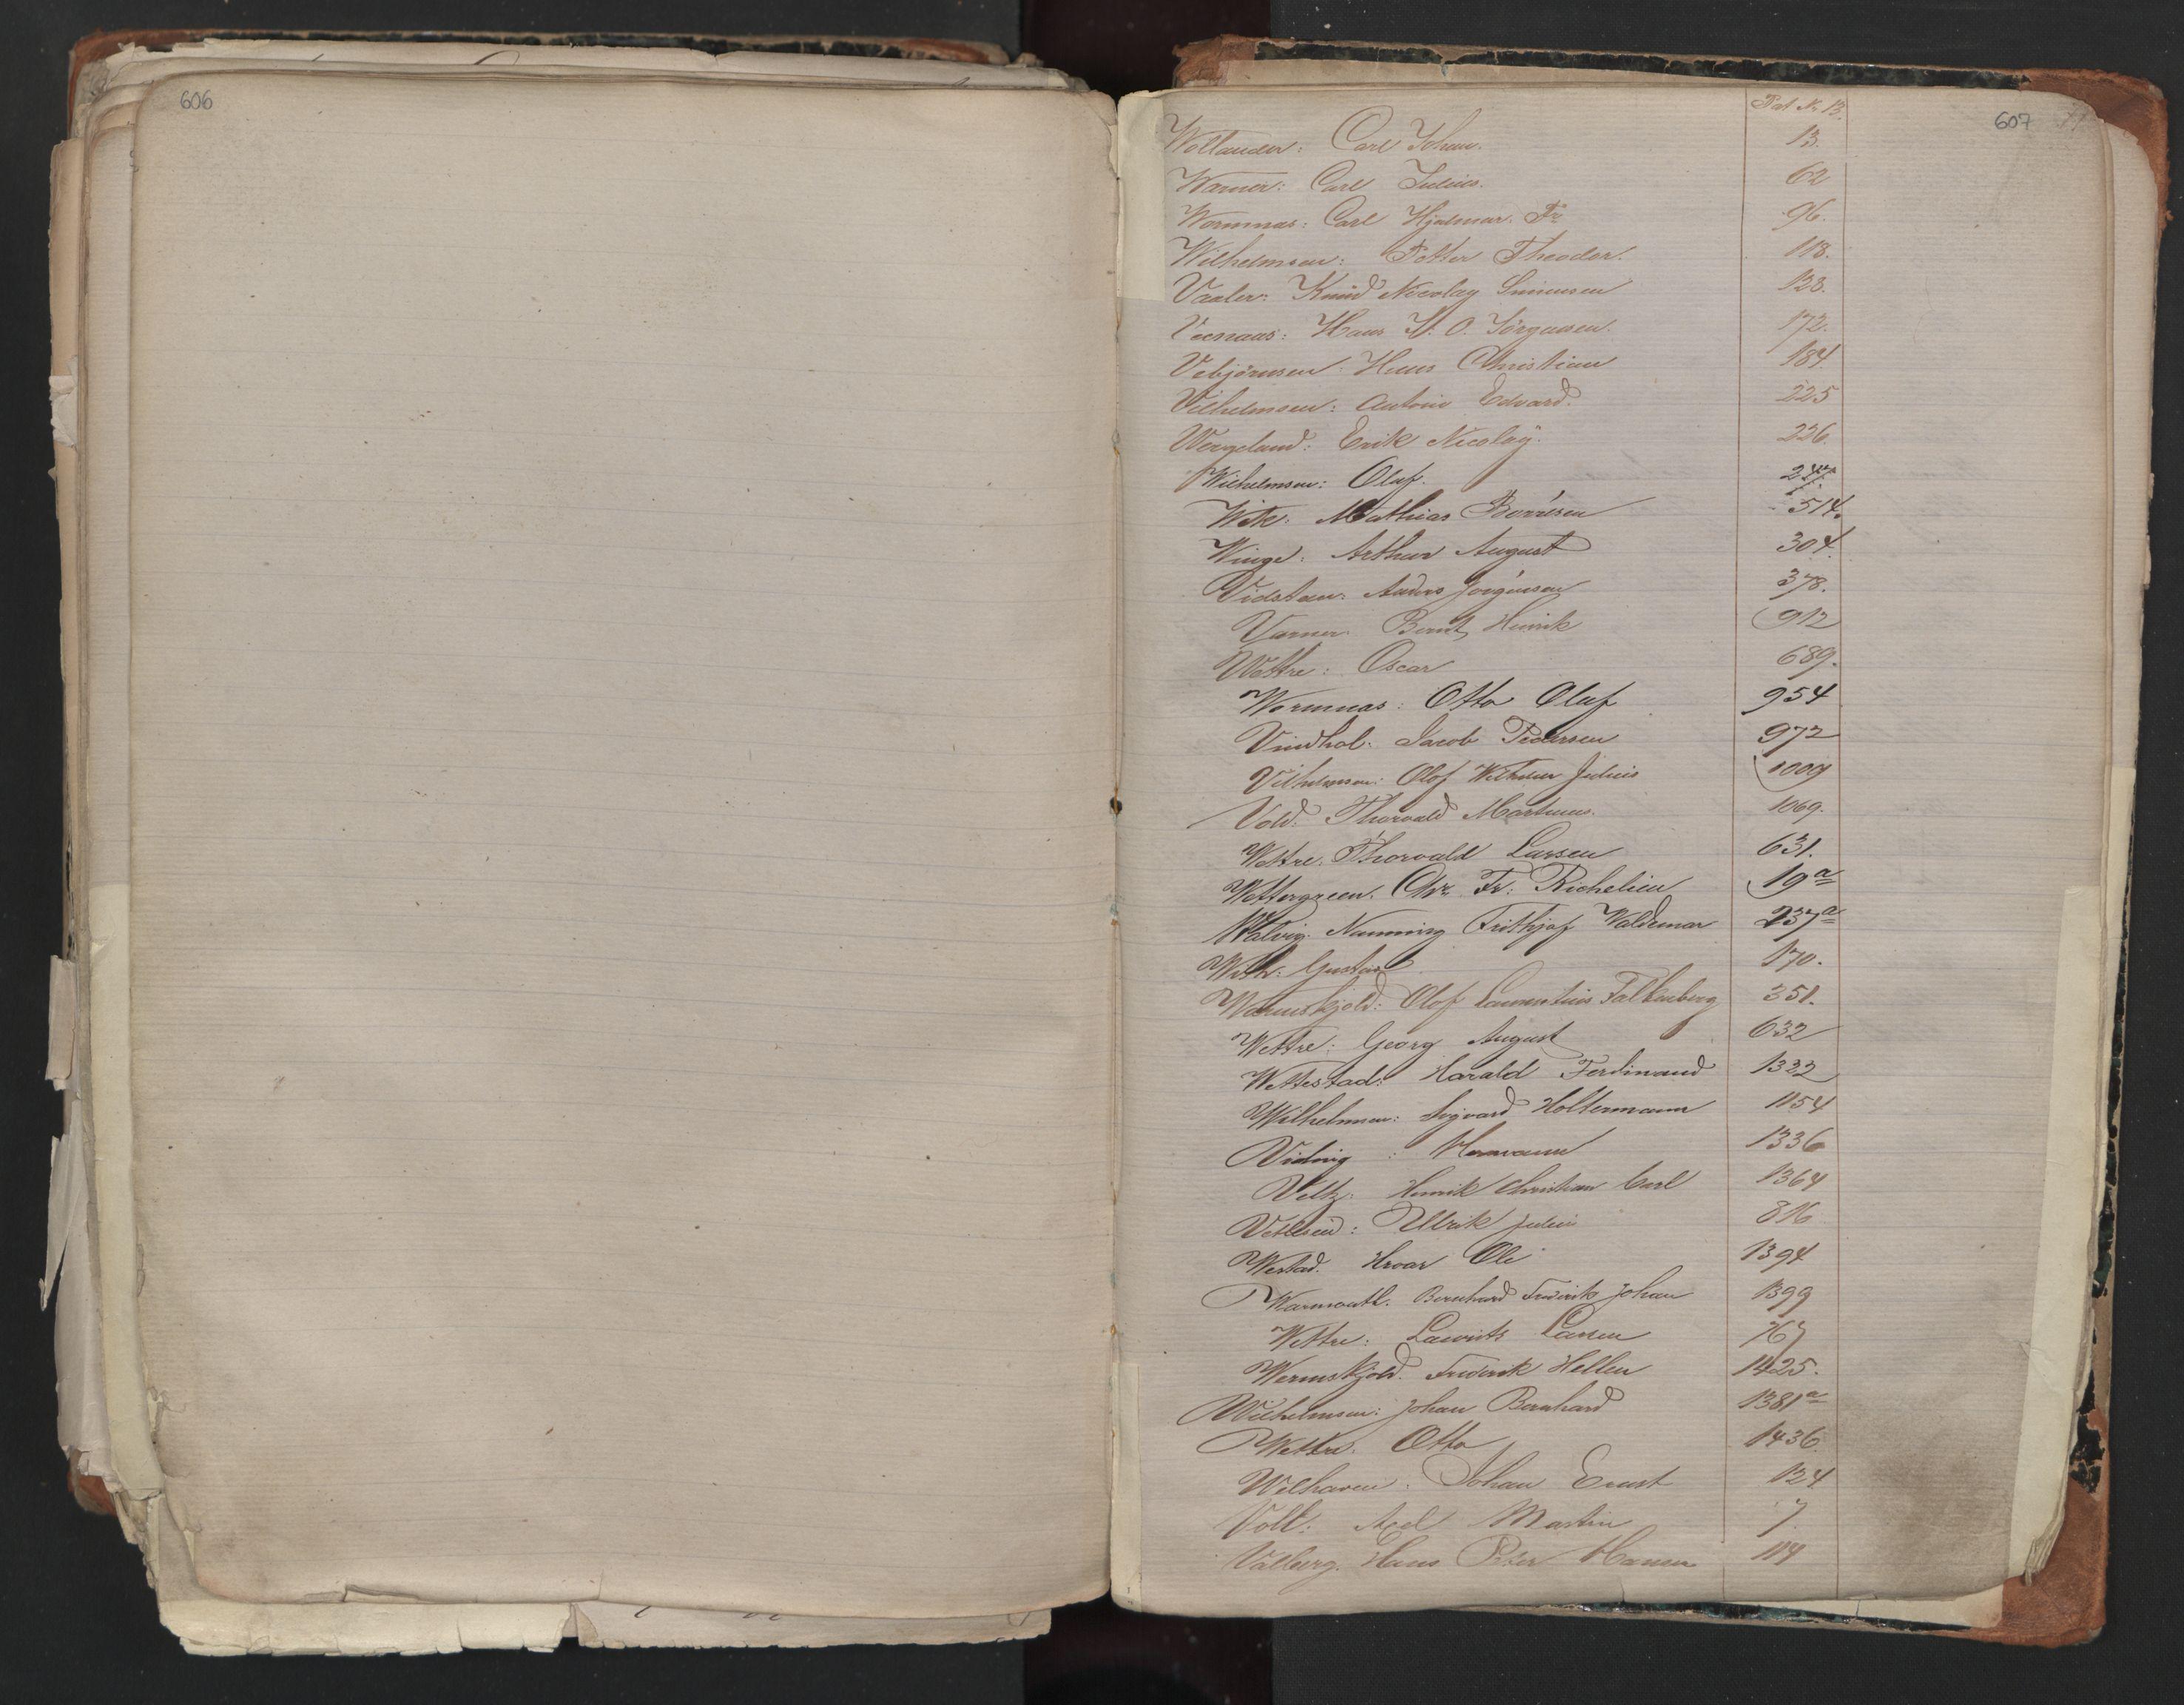 SAO, Oslo sjømannskontor, F/Fa/L0001: Register for Kristiania krets, 1866-1891, s. 606-607